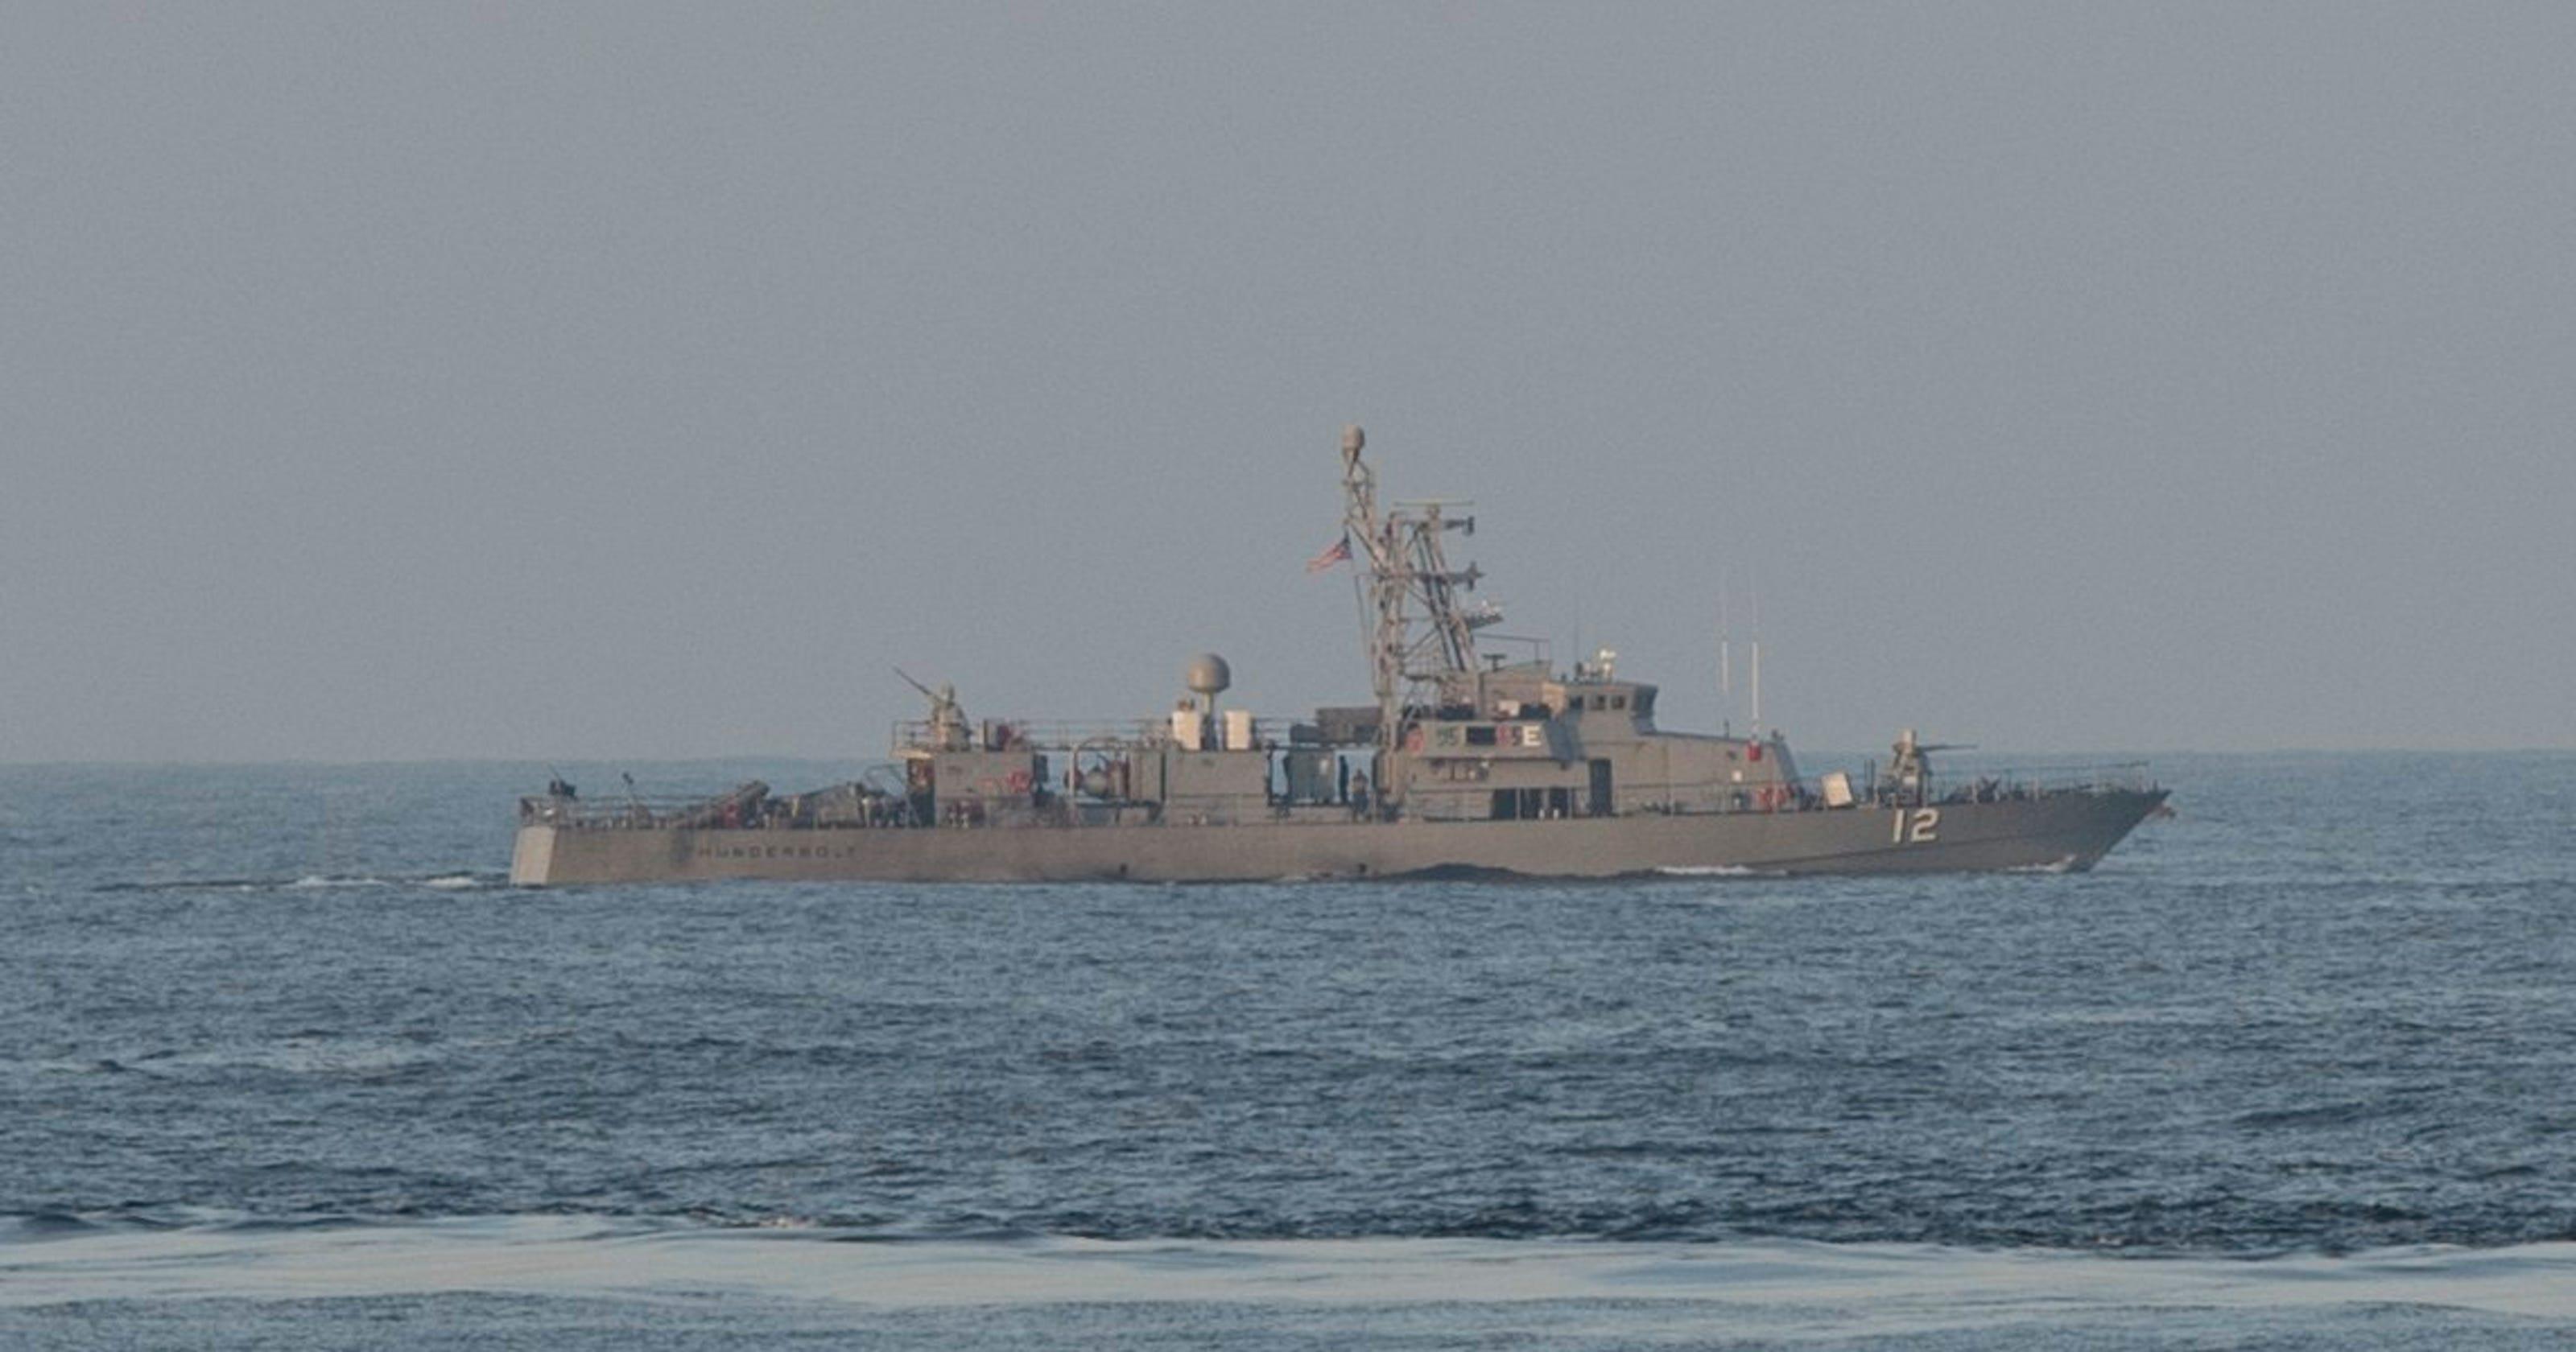 Uss Thunderbolt Fires Warning Shots At Iranian Ship In Unsafe Gulf